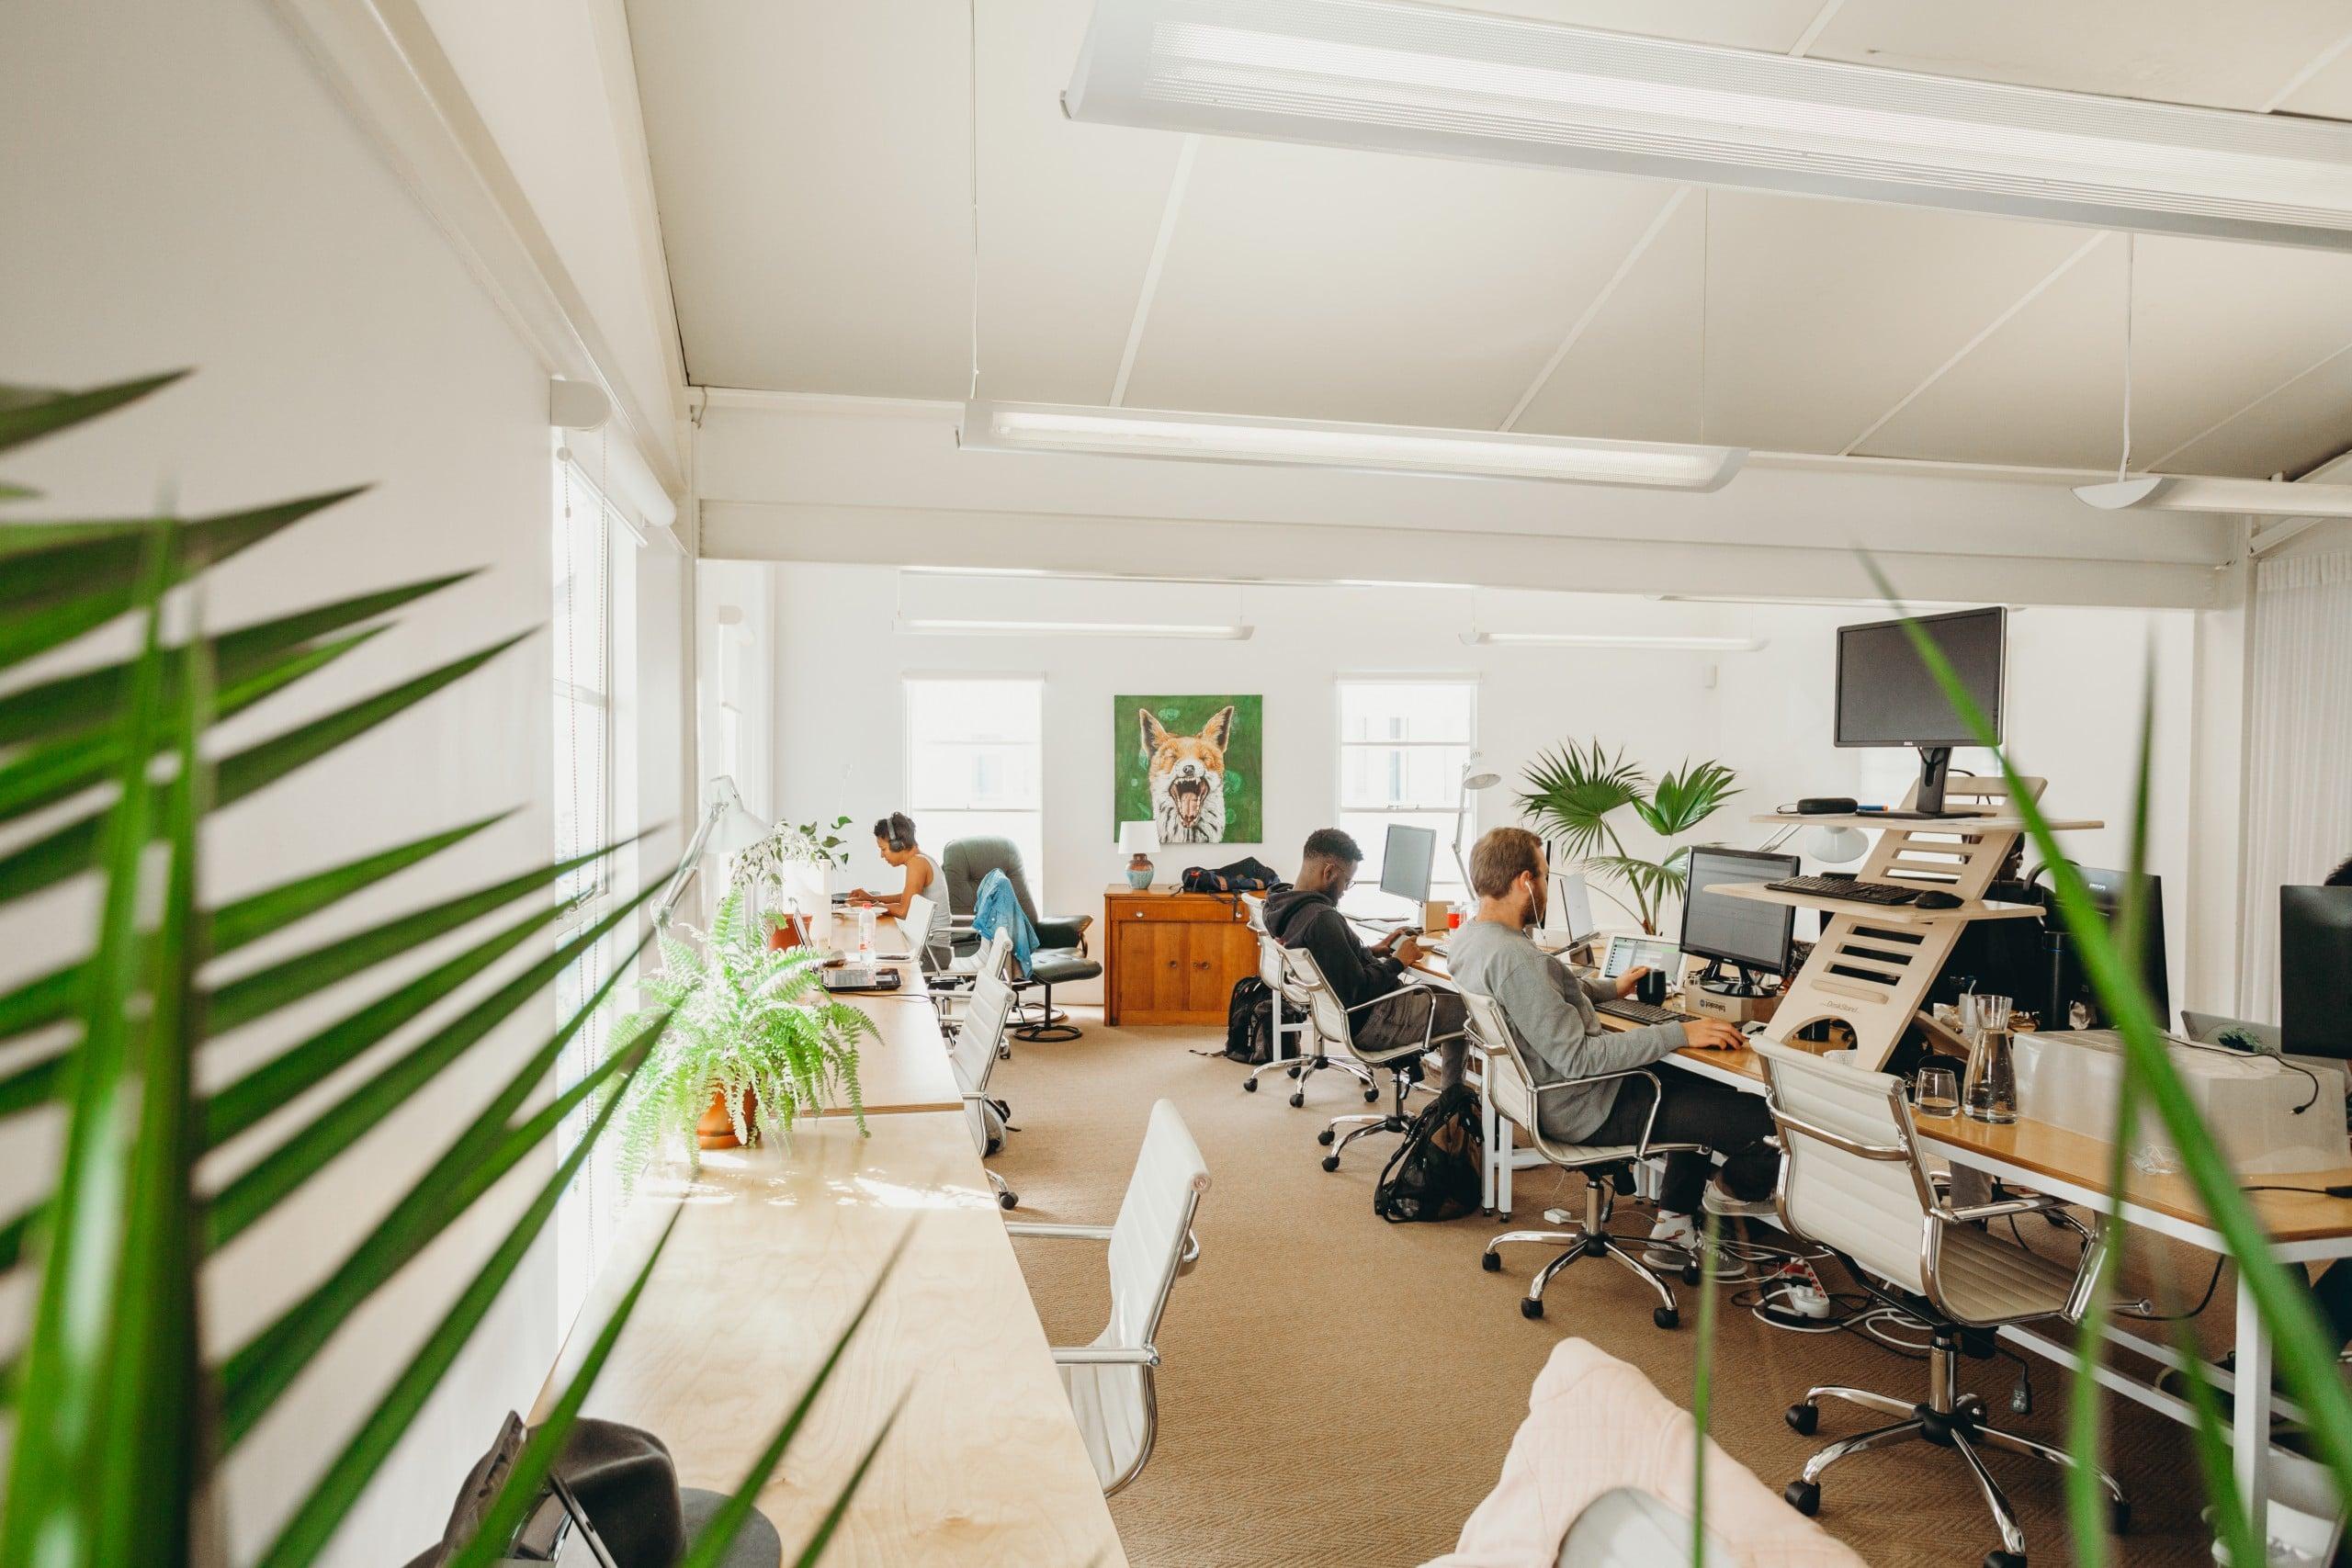 Dedicated Desk Space